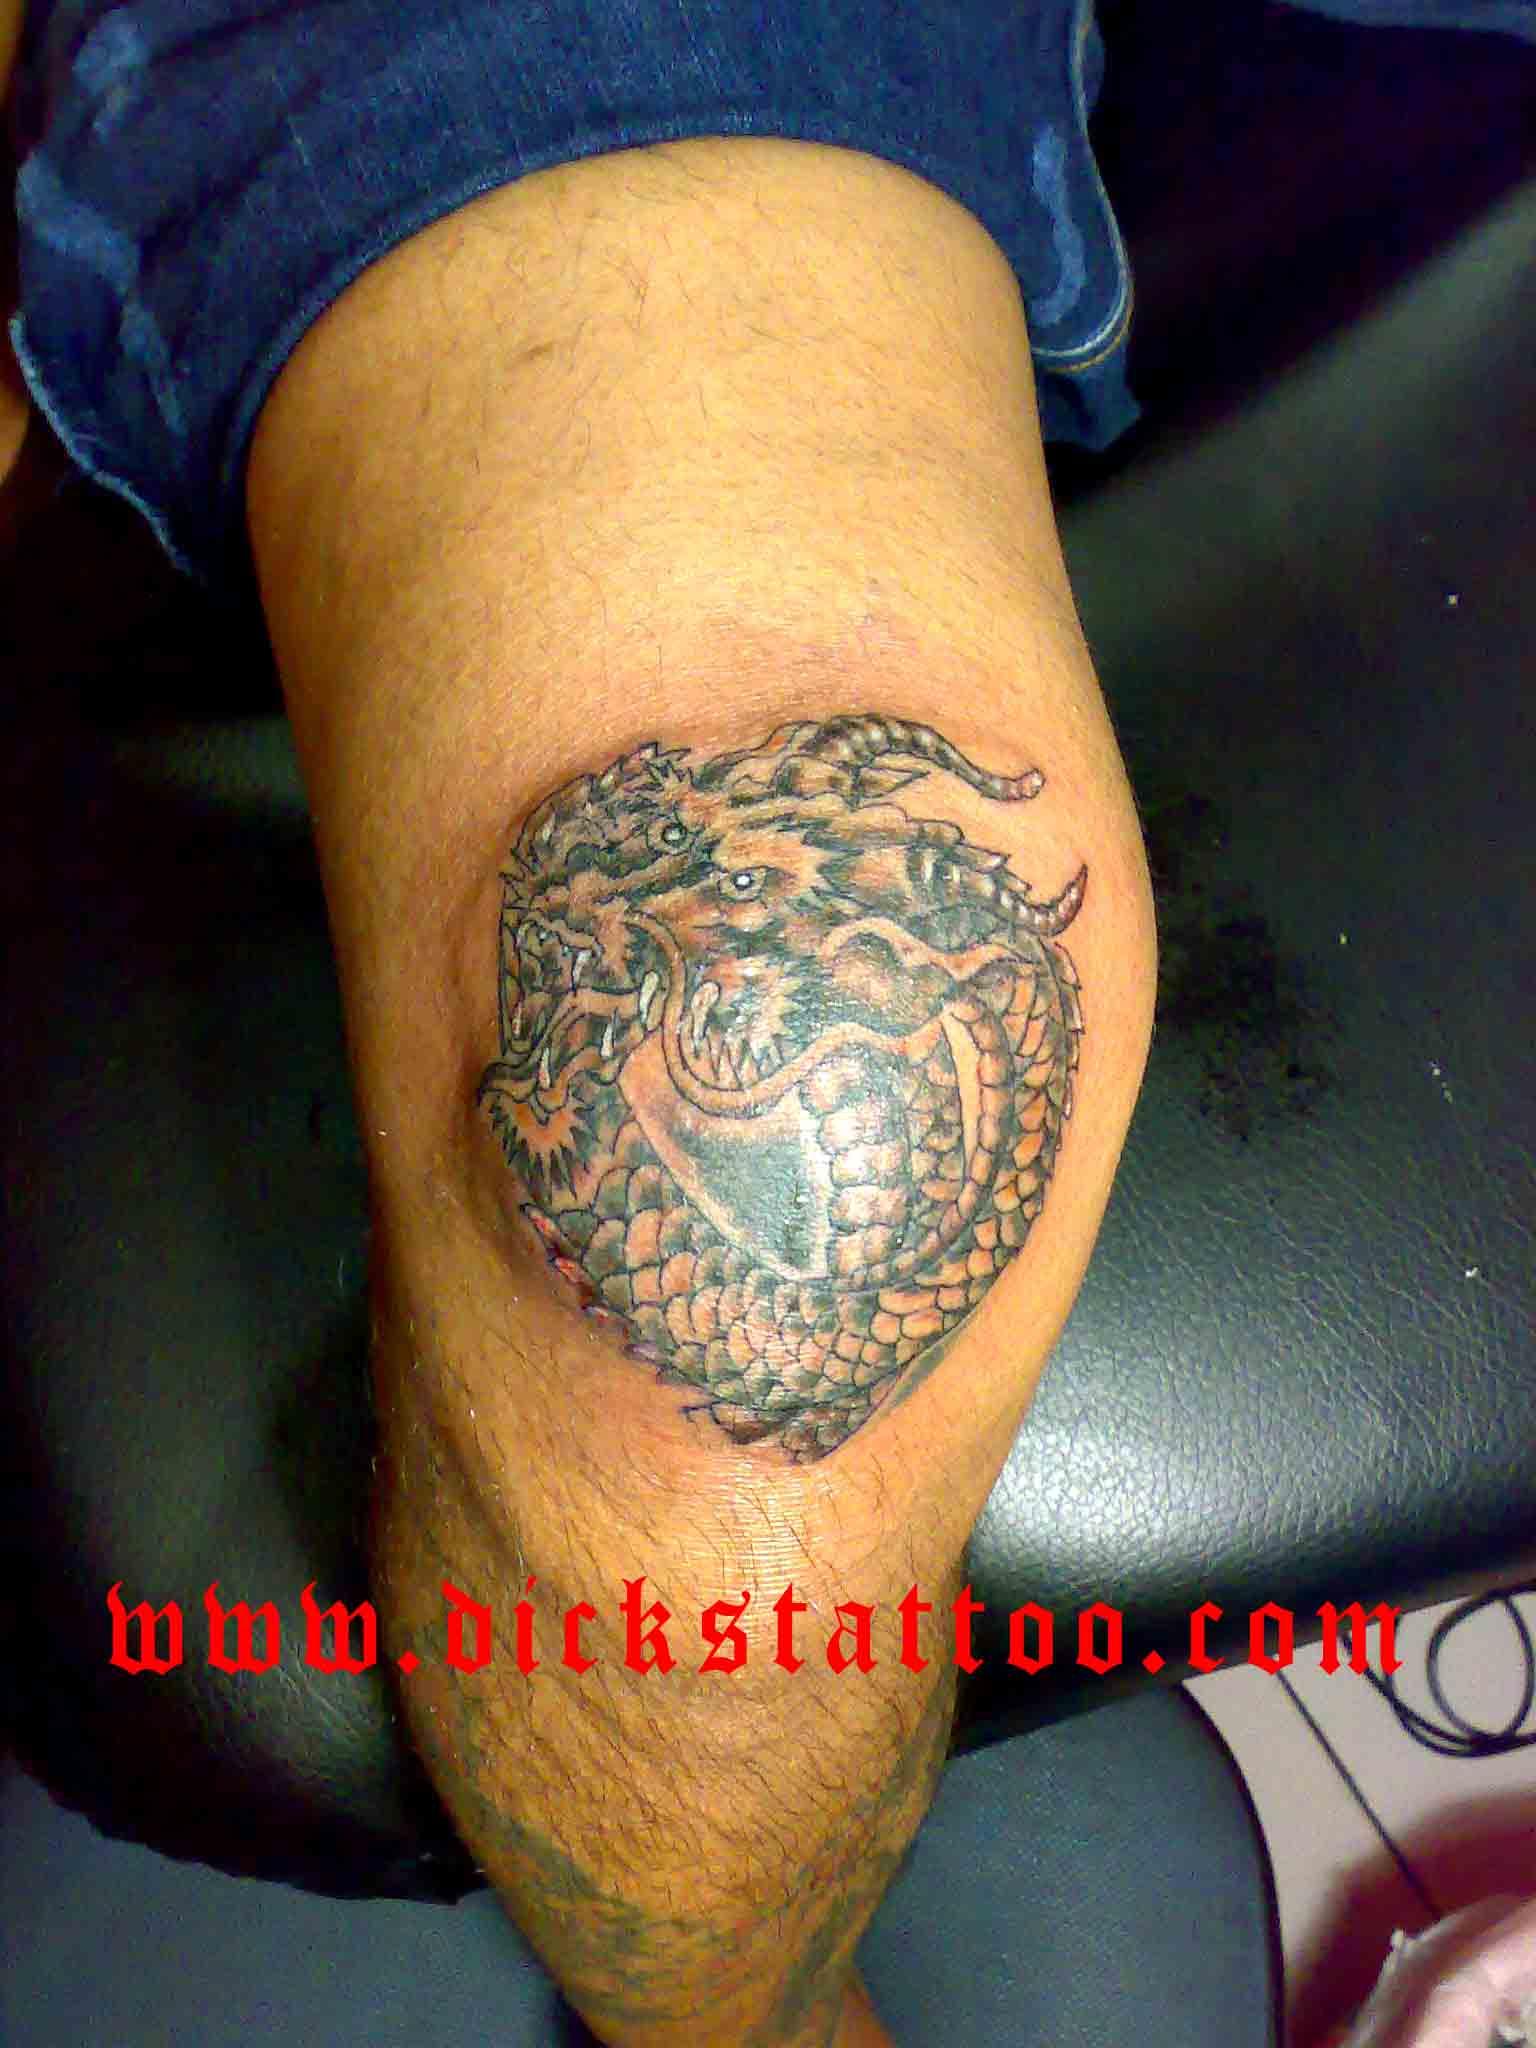 Tattoo Jakarta Studio Lainnya Foto/Gambar Umum